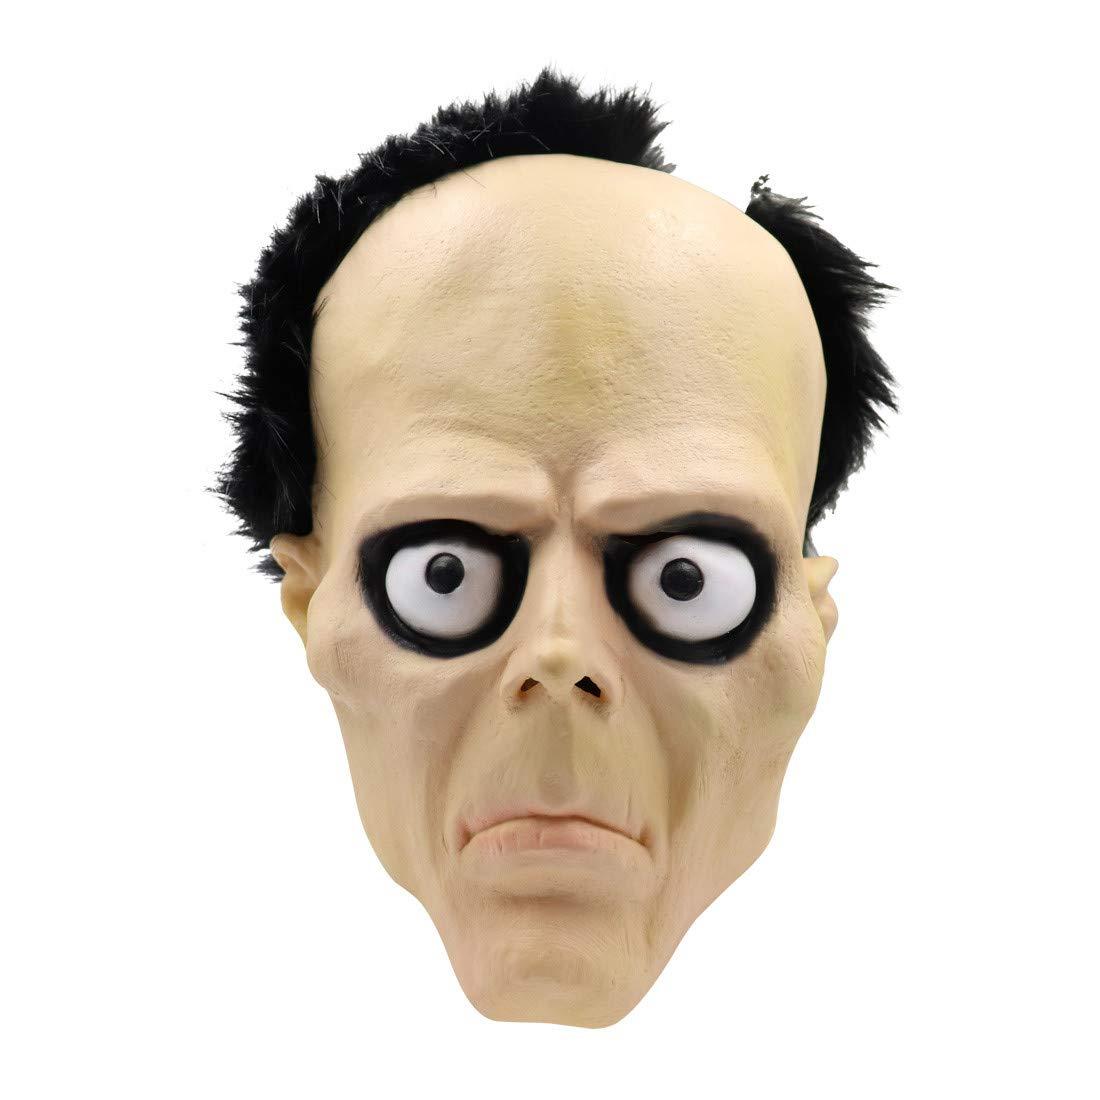 Meetsunshine Halloween Halloween Mask, Fancy Scary Head Mask Latex Man Horror Masks Party Cosplay Props by Meetsunshine Halloween